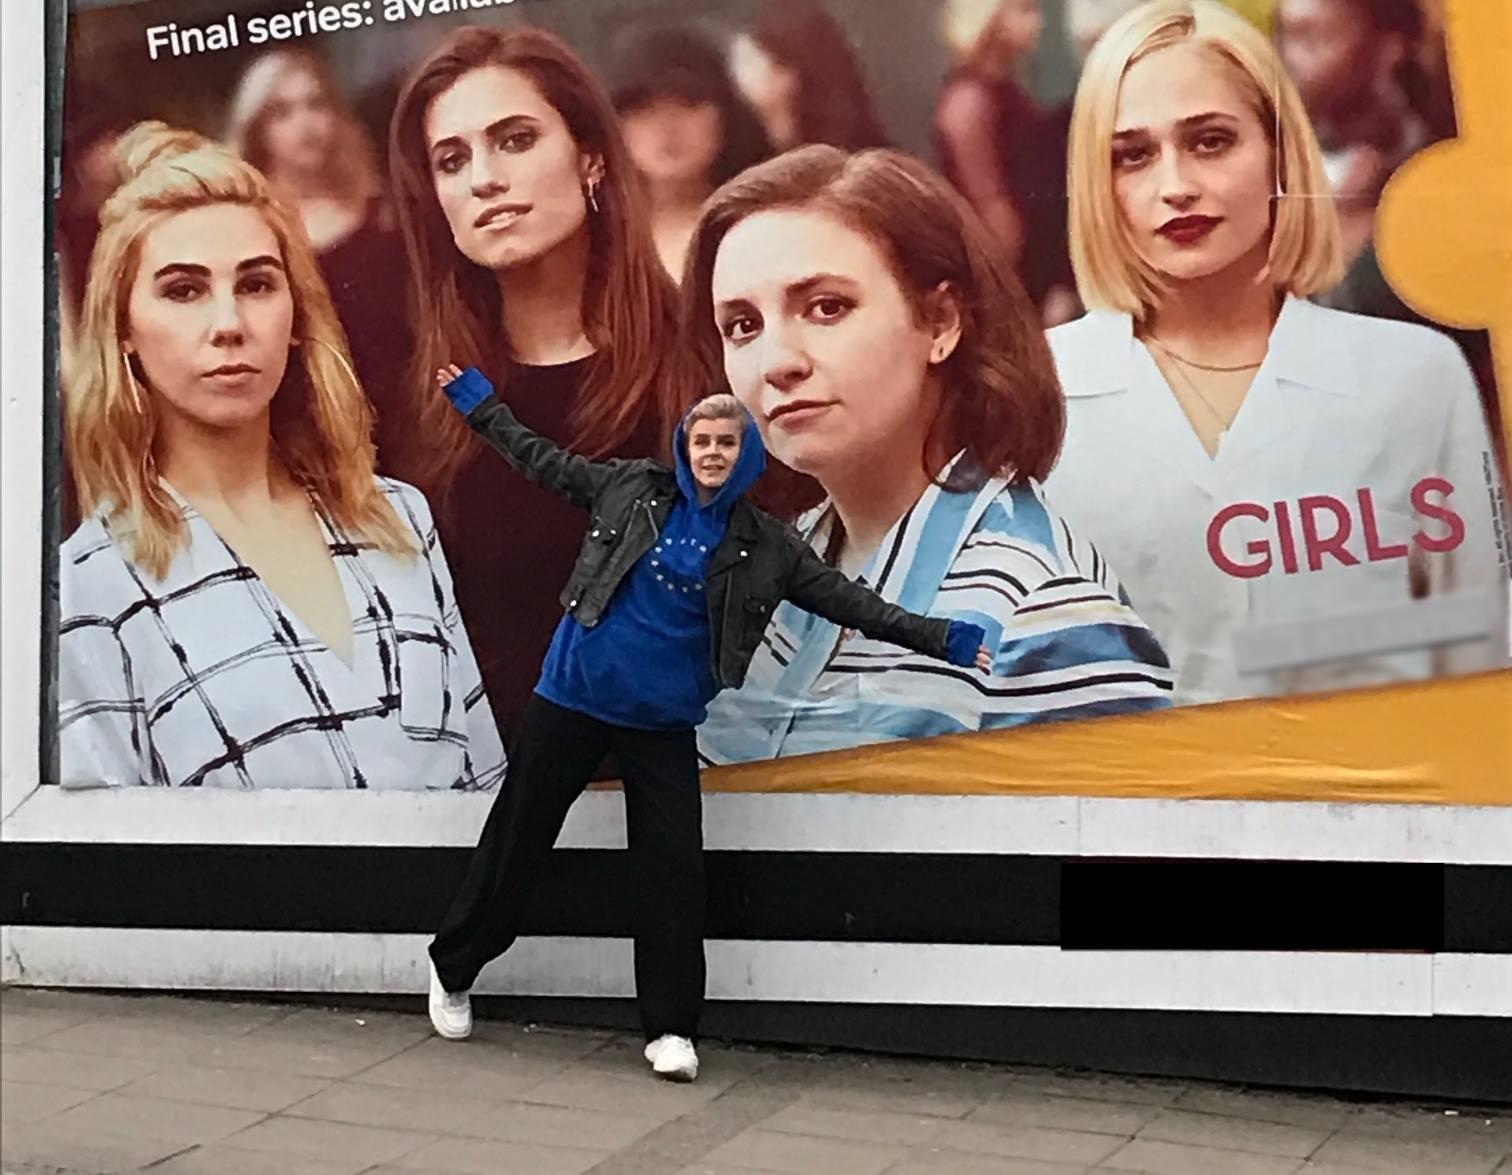 Robyn fotografie poster Girls HBO